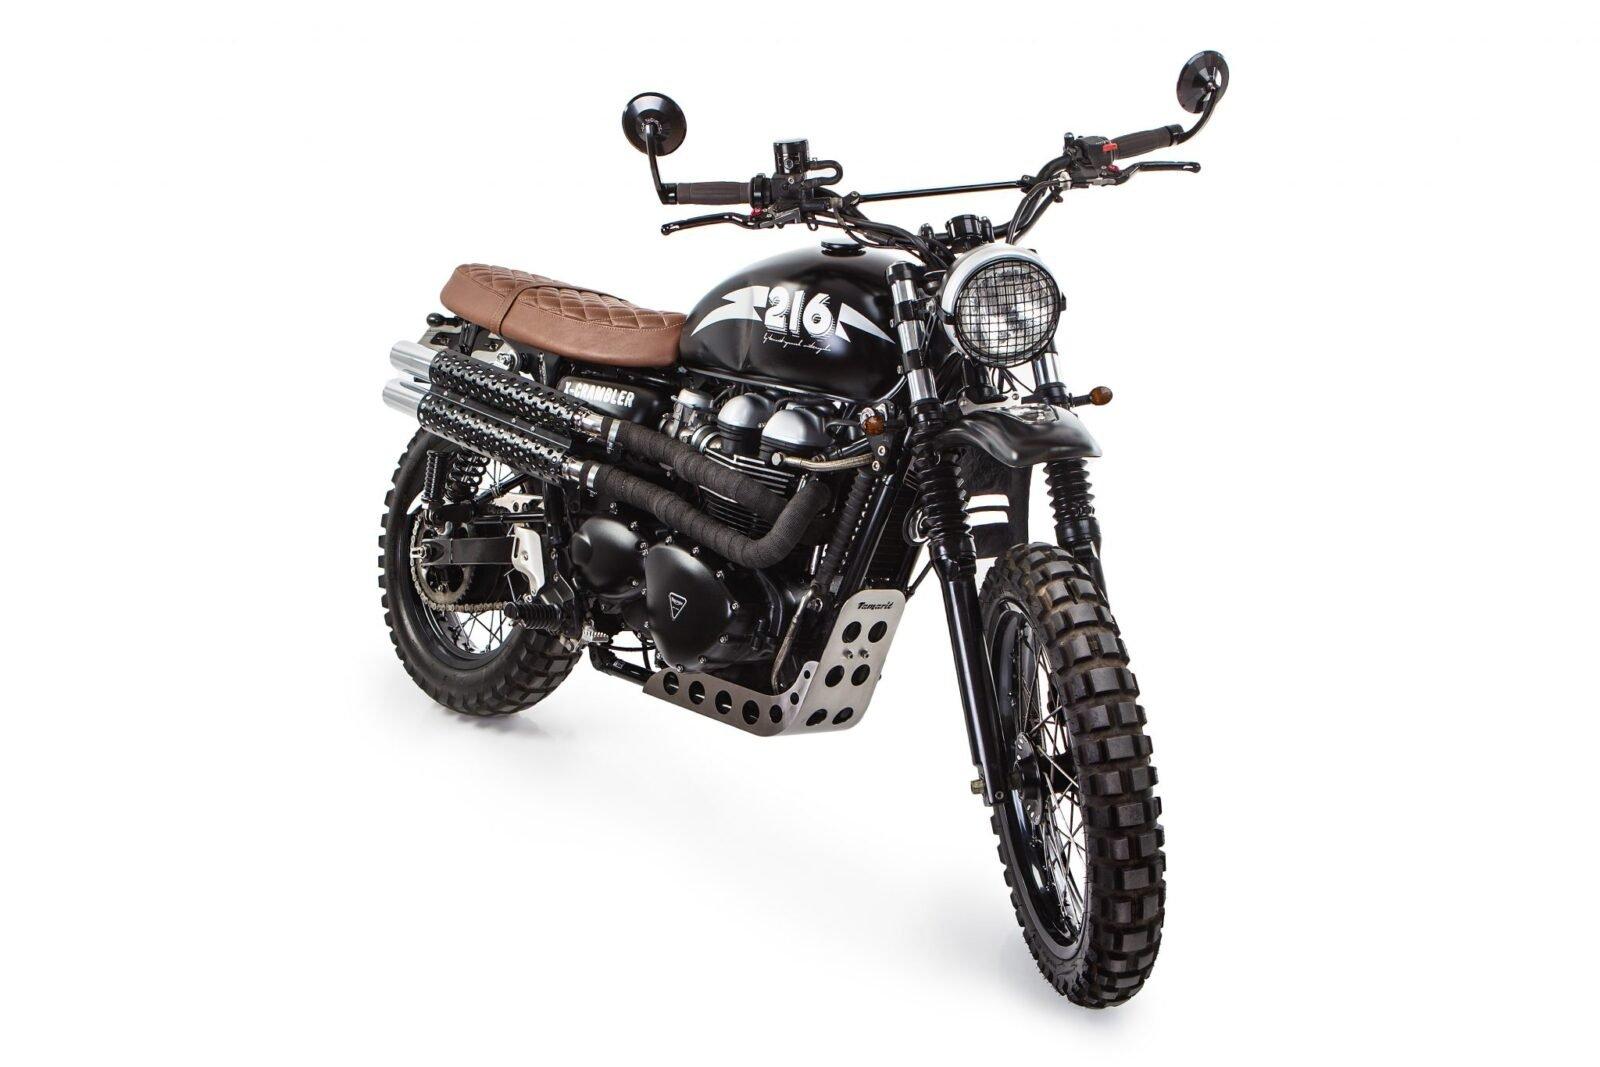 Triumph Scrambler 5 1600x1067 - Tamarit Motorcycles Triumph Scrambler #216